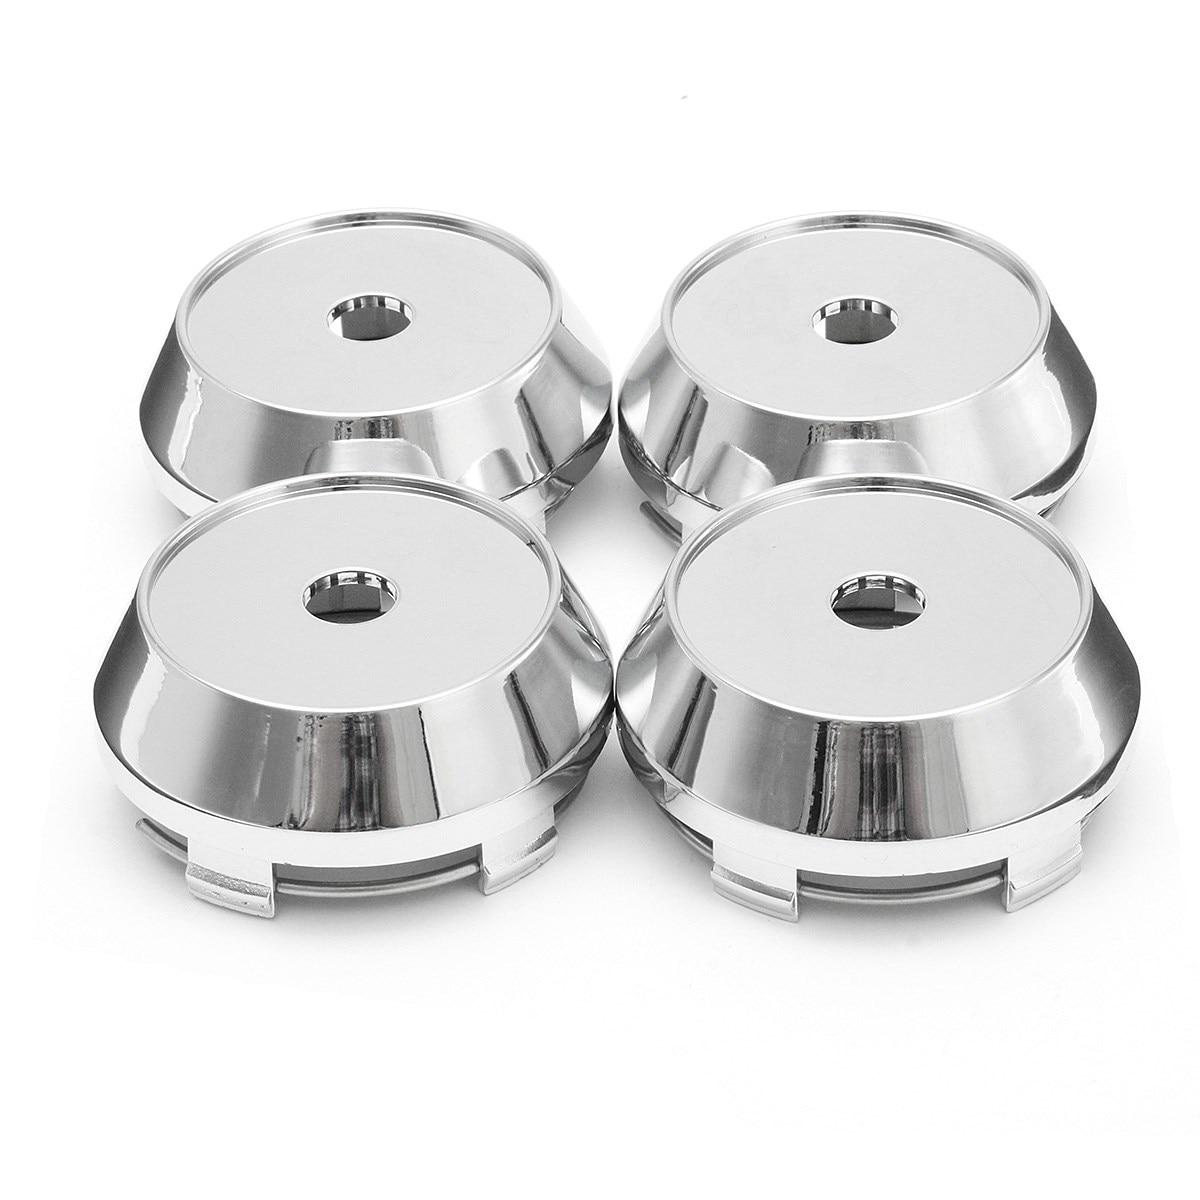 4 Pcs ein set 60mm Silber ABS Kunststoff Auto Räder Center Caps Hub Radkappe Emblem